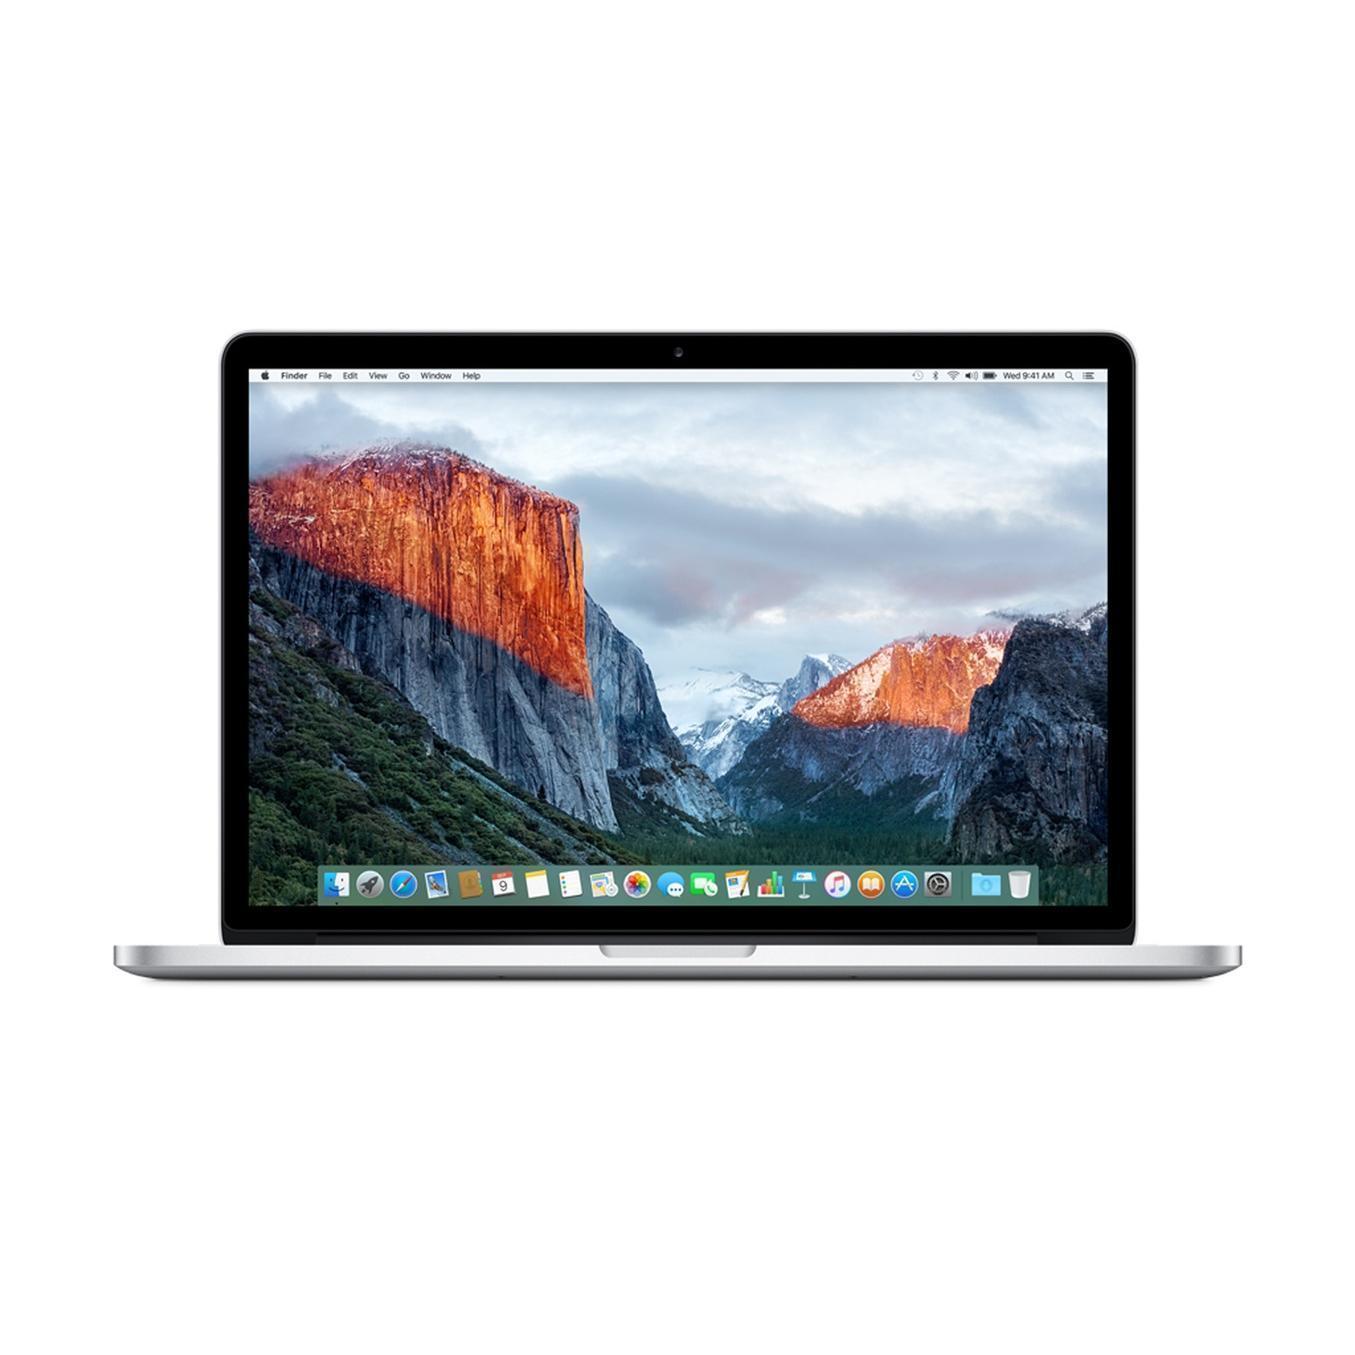 MacBook Pro Retina 15,4-tum (2012) - Core i7 - 16GB - SSD 500 GB QWERTY - Nederländska